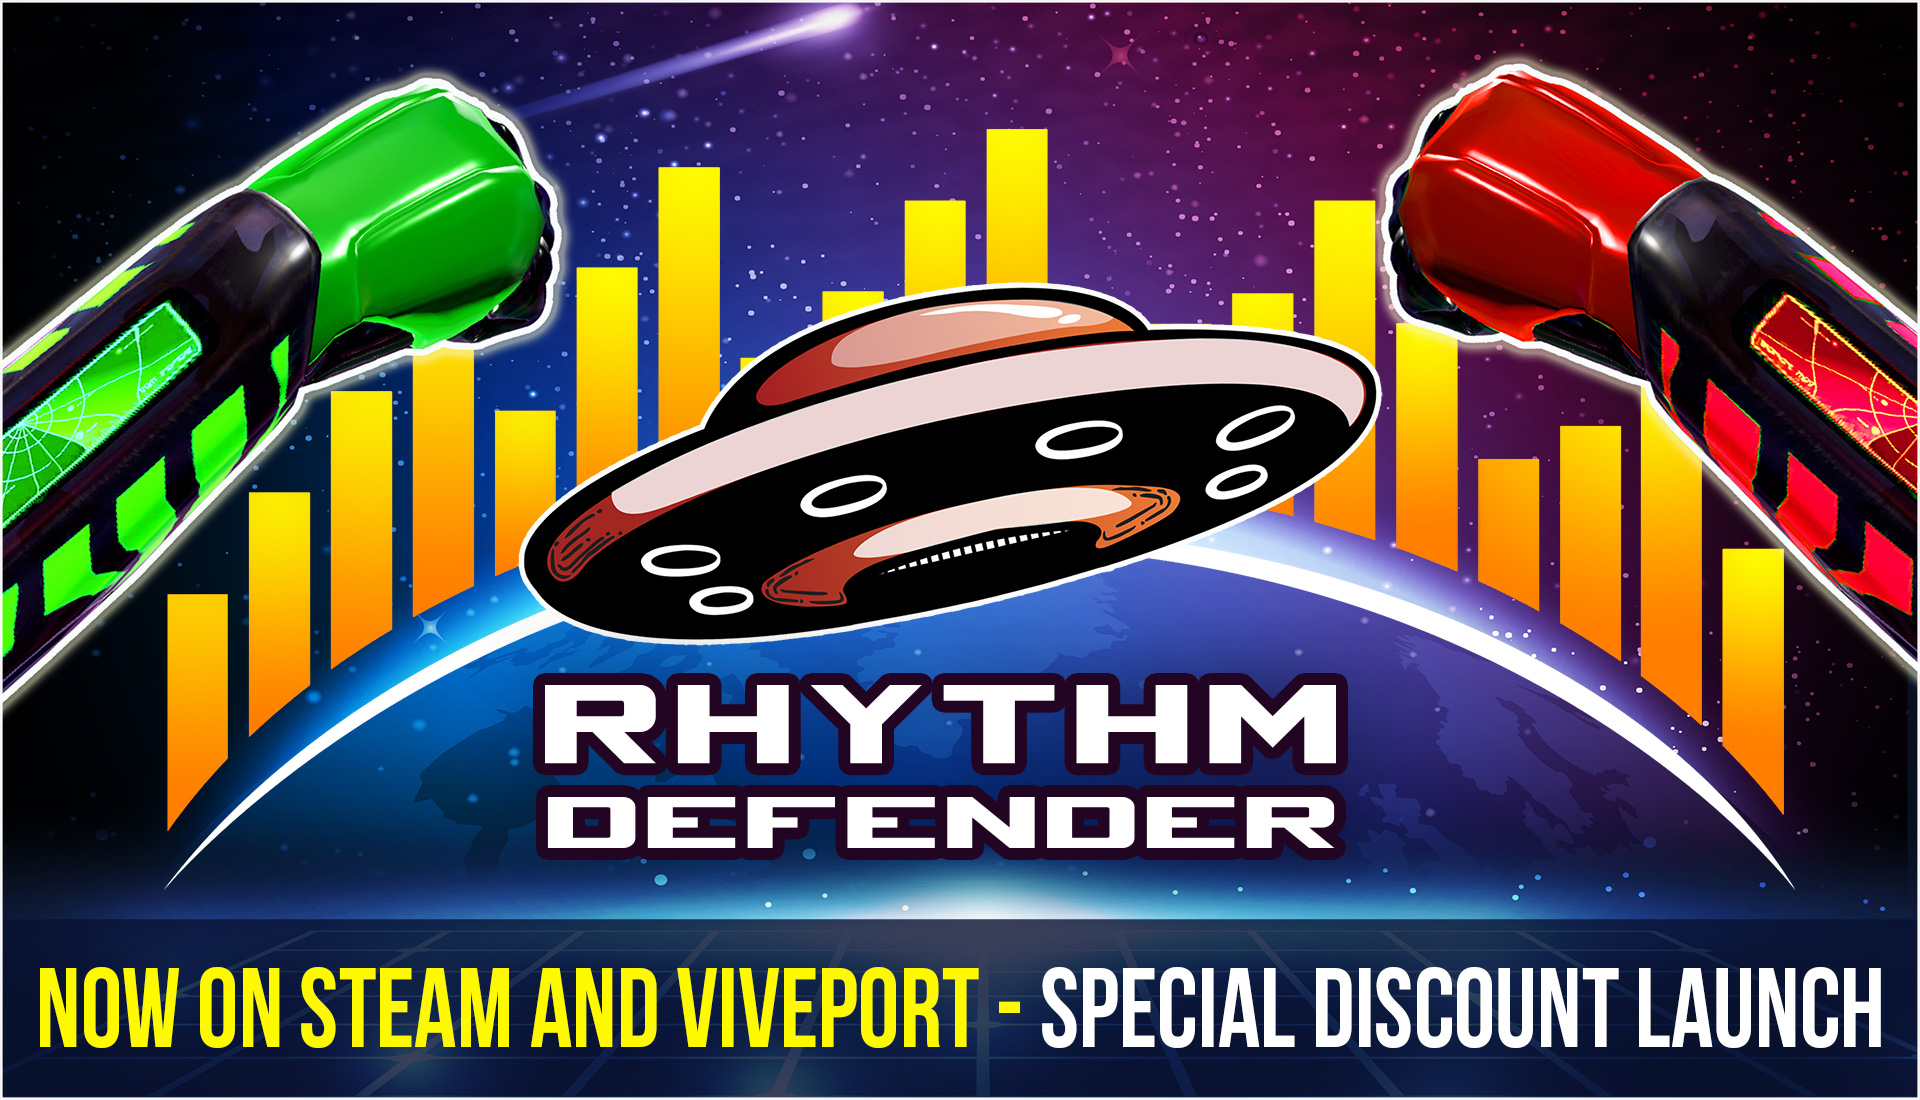 rhythm defender is out